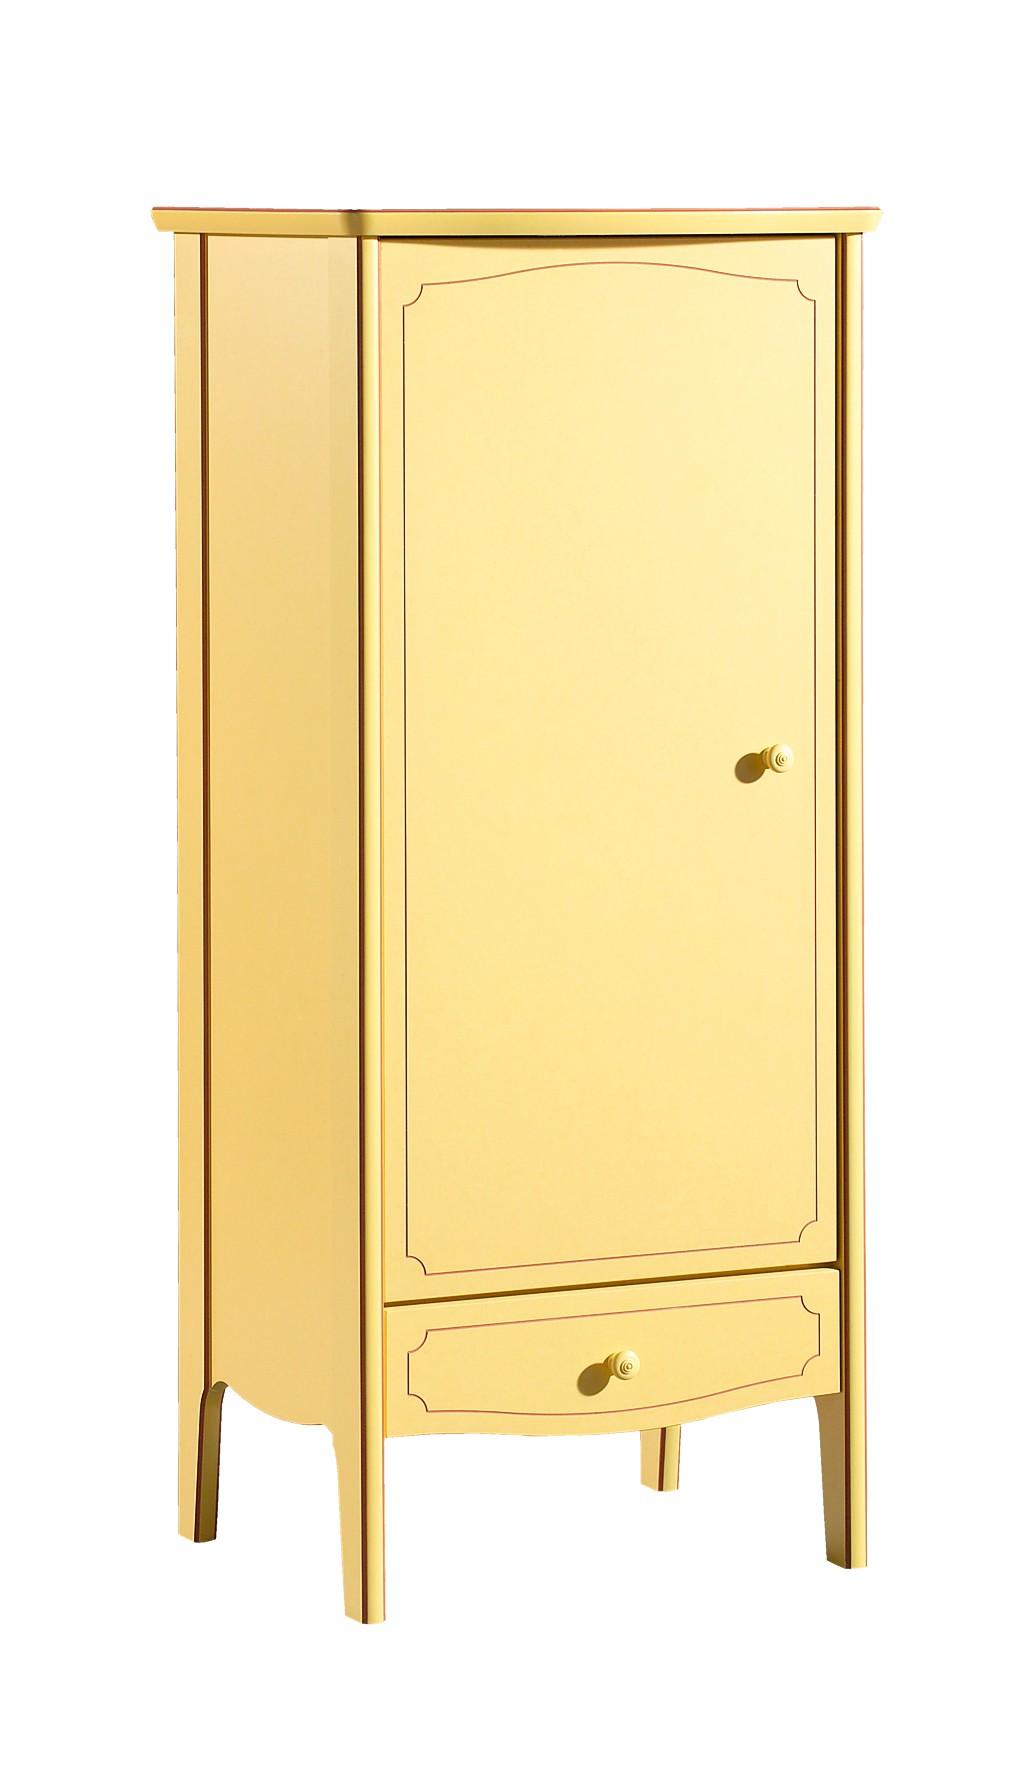 mobilier de chambre m dicalis e collection provence. Black Bedroom Furniture Sets. Home Design Ideas